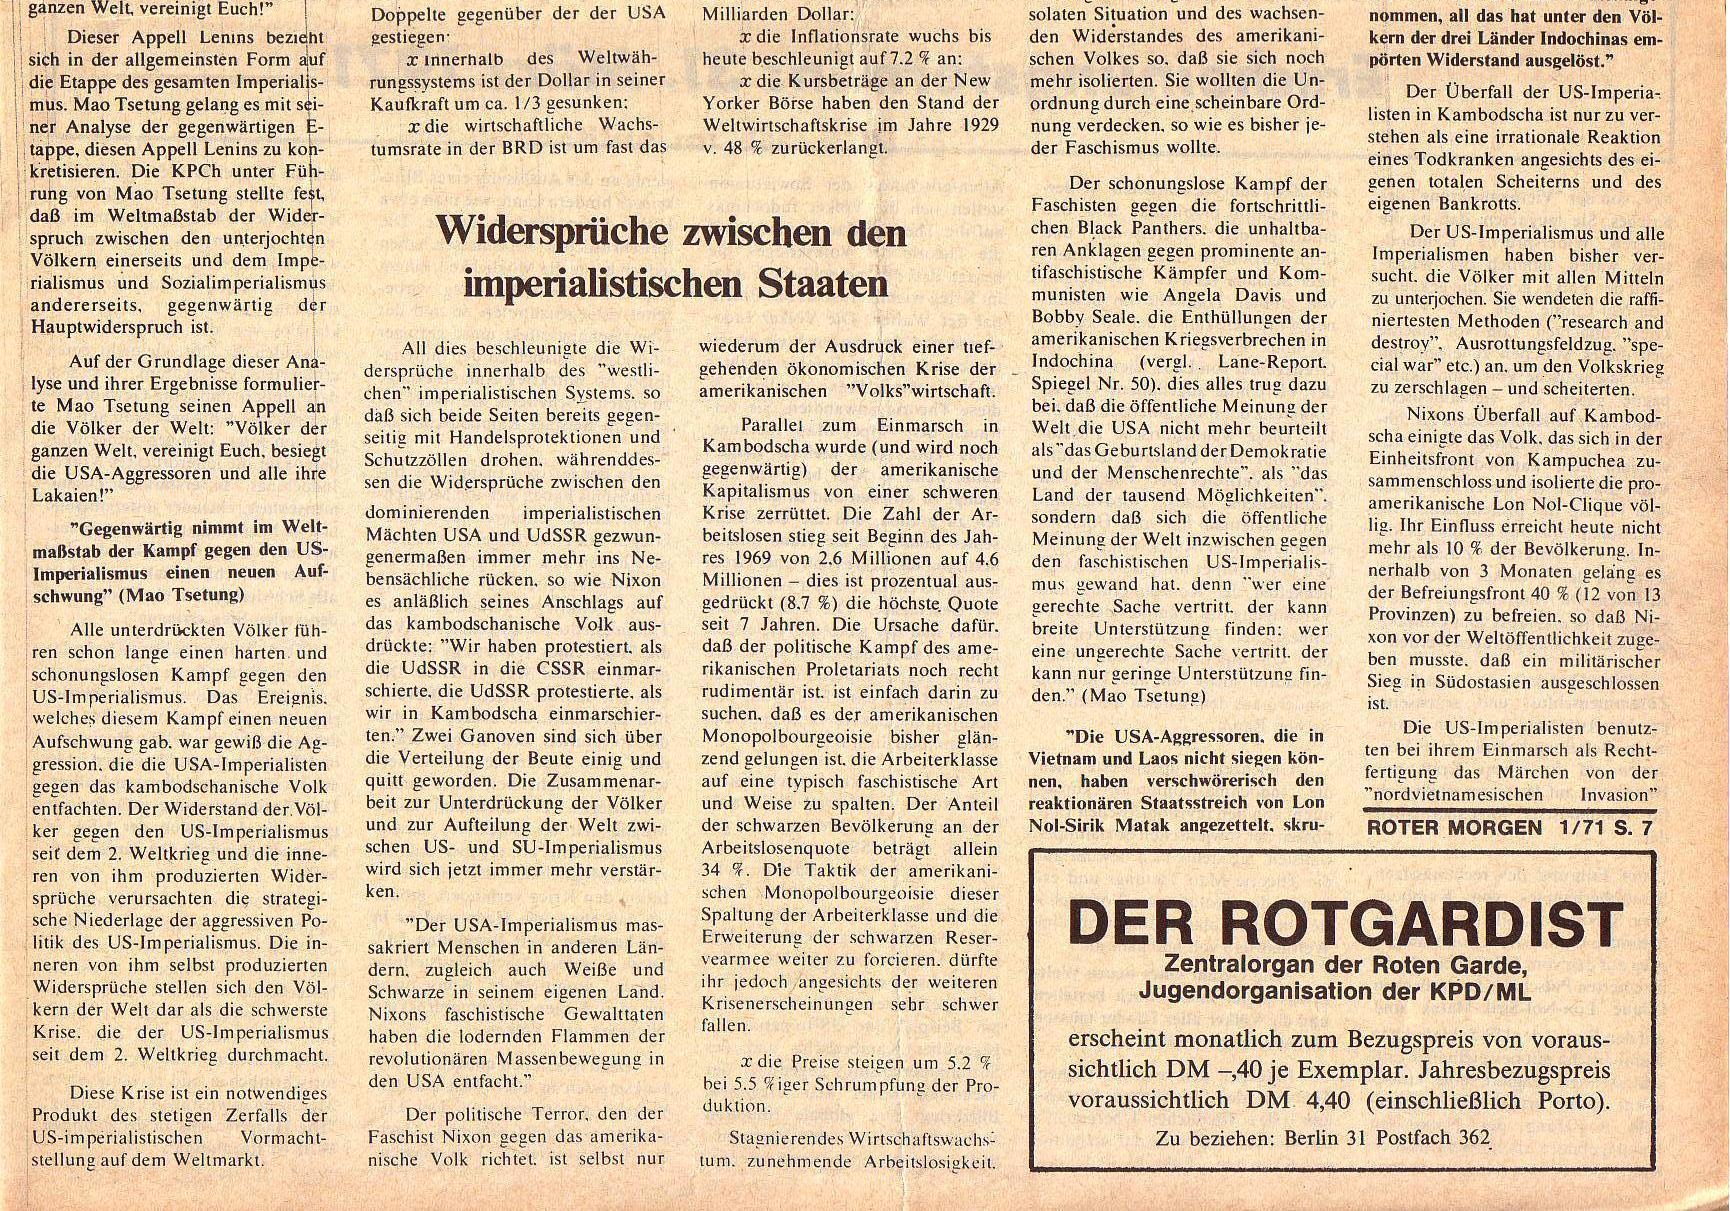 Roter Morgen, 5. Jg., Januar 1971, Nr. 1, Seite 7b